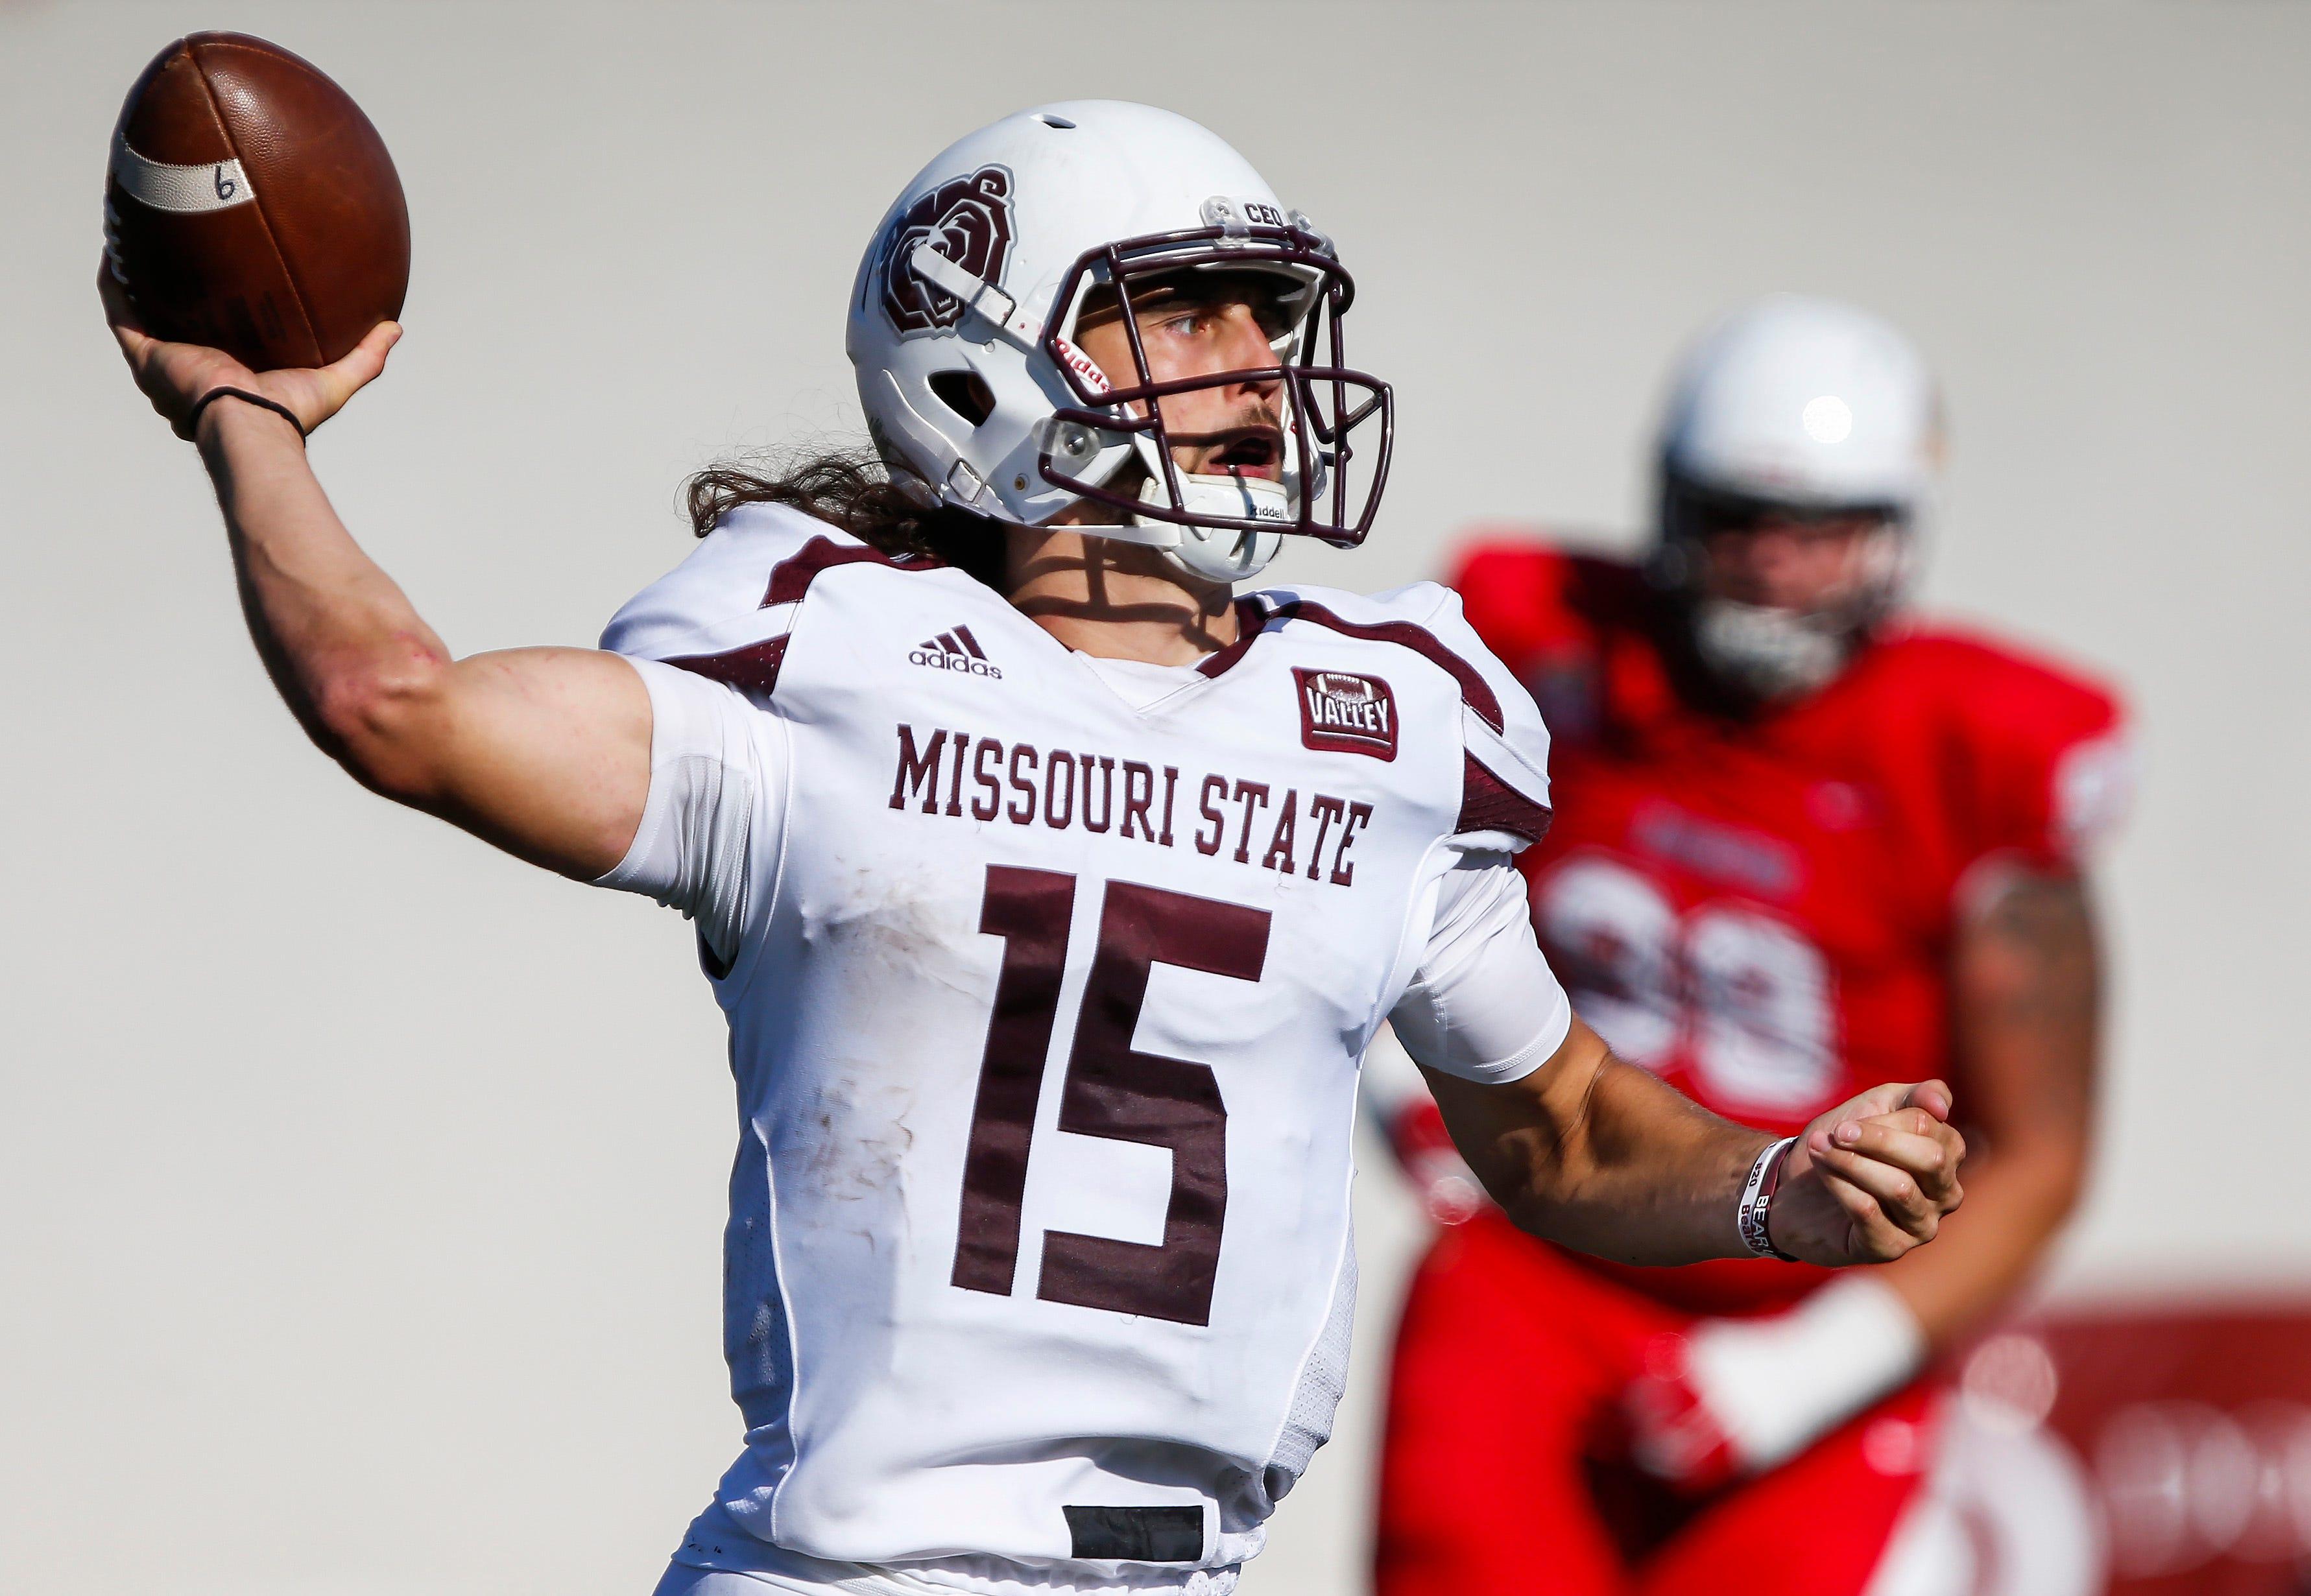 The Missouri State Bears defeated the Illinois State Redbirds 24-21 at Plaster Stadium on Saturday, Sept. 29, 2018.